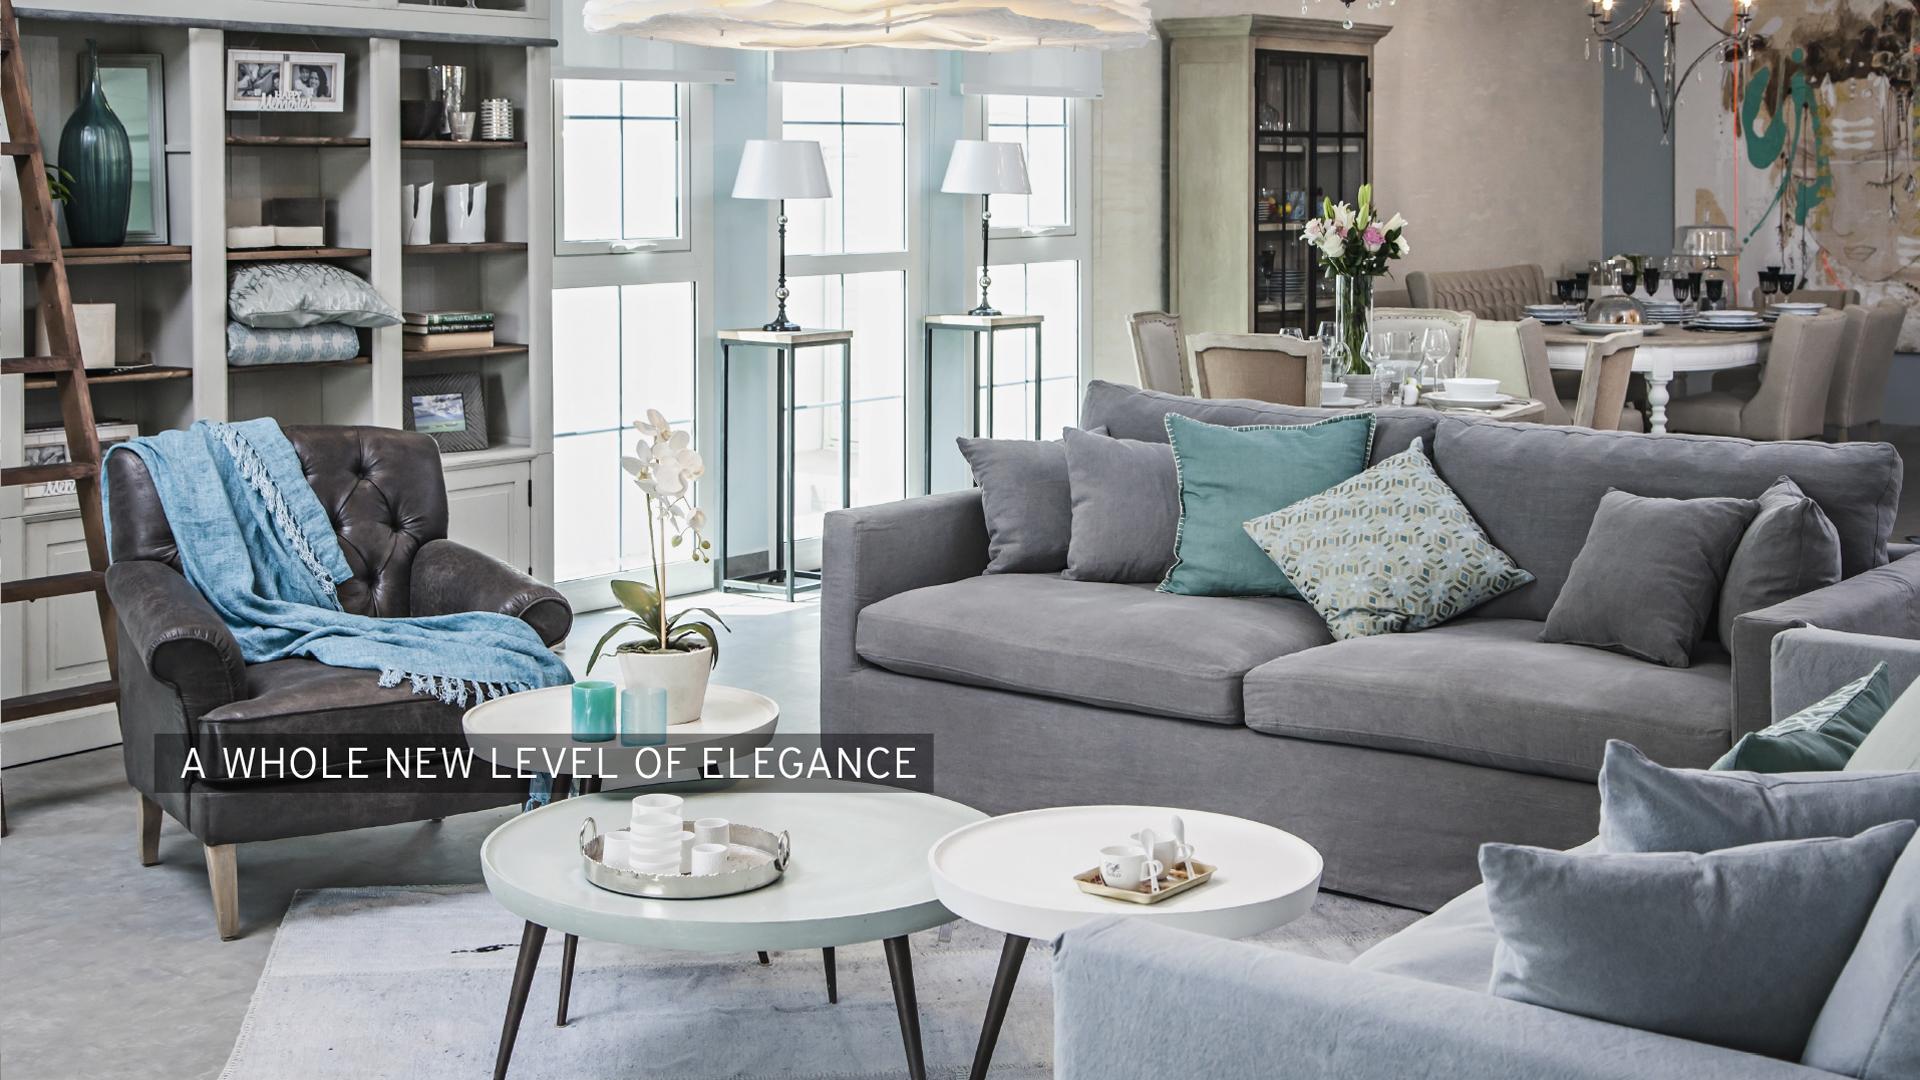 Blanc D\'ivoire Home Interior Furniture Dubai | Arabia Weddings